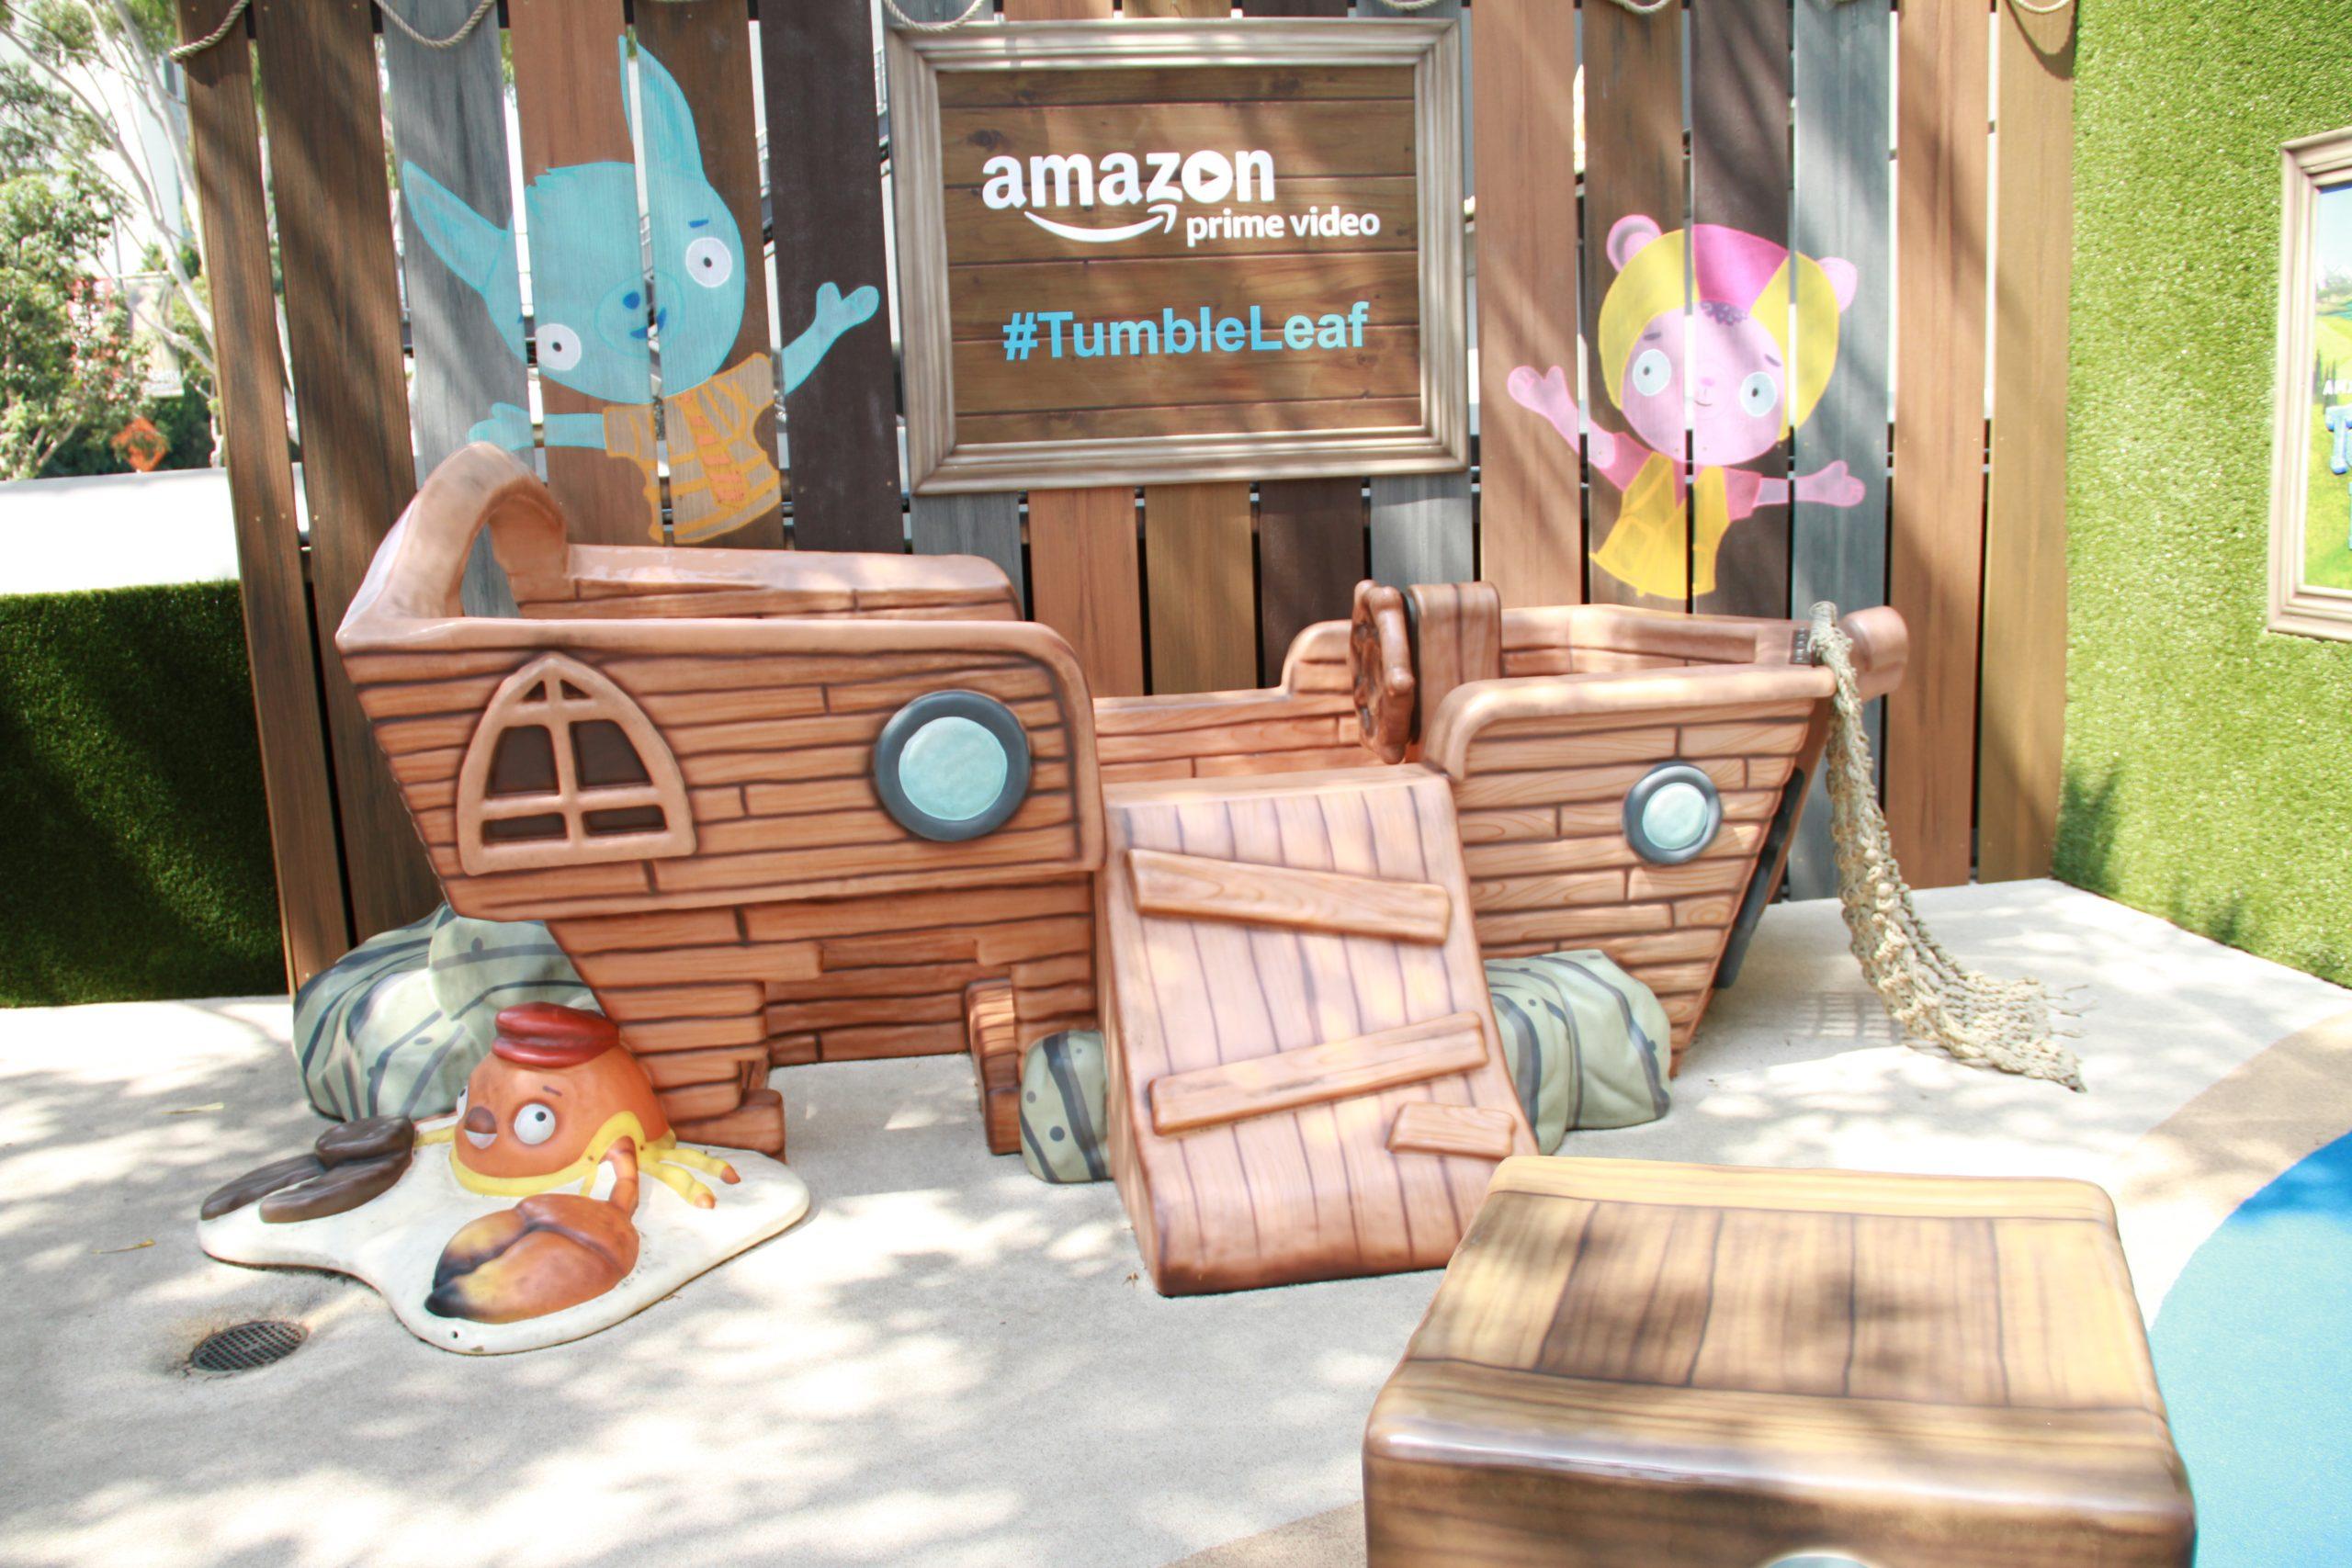 Amazon branded sculpture